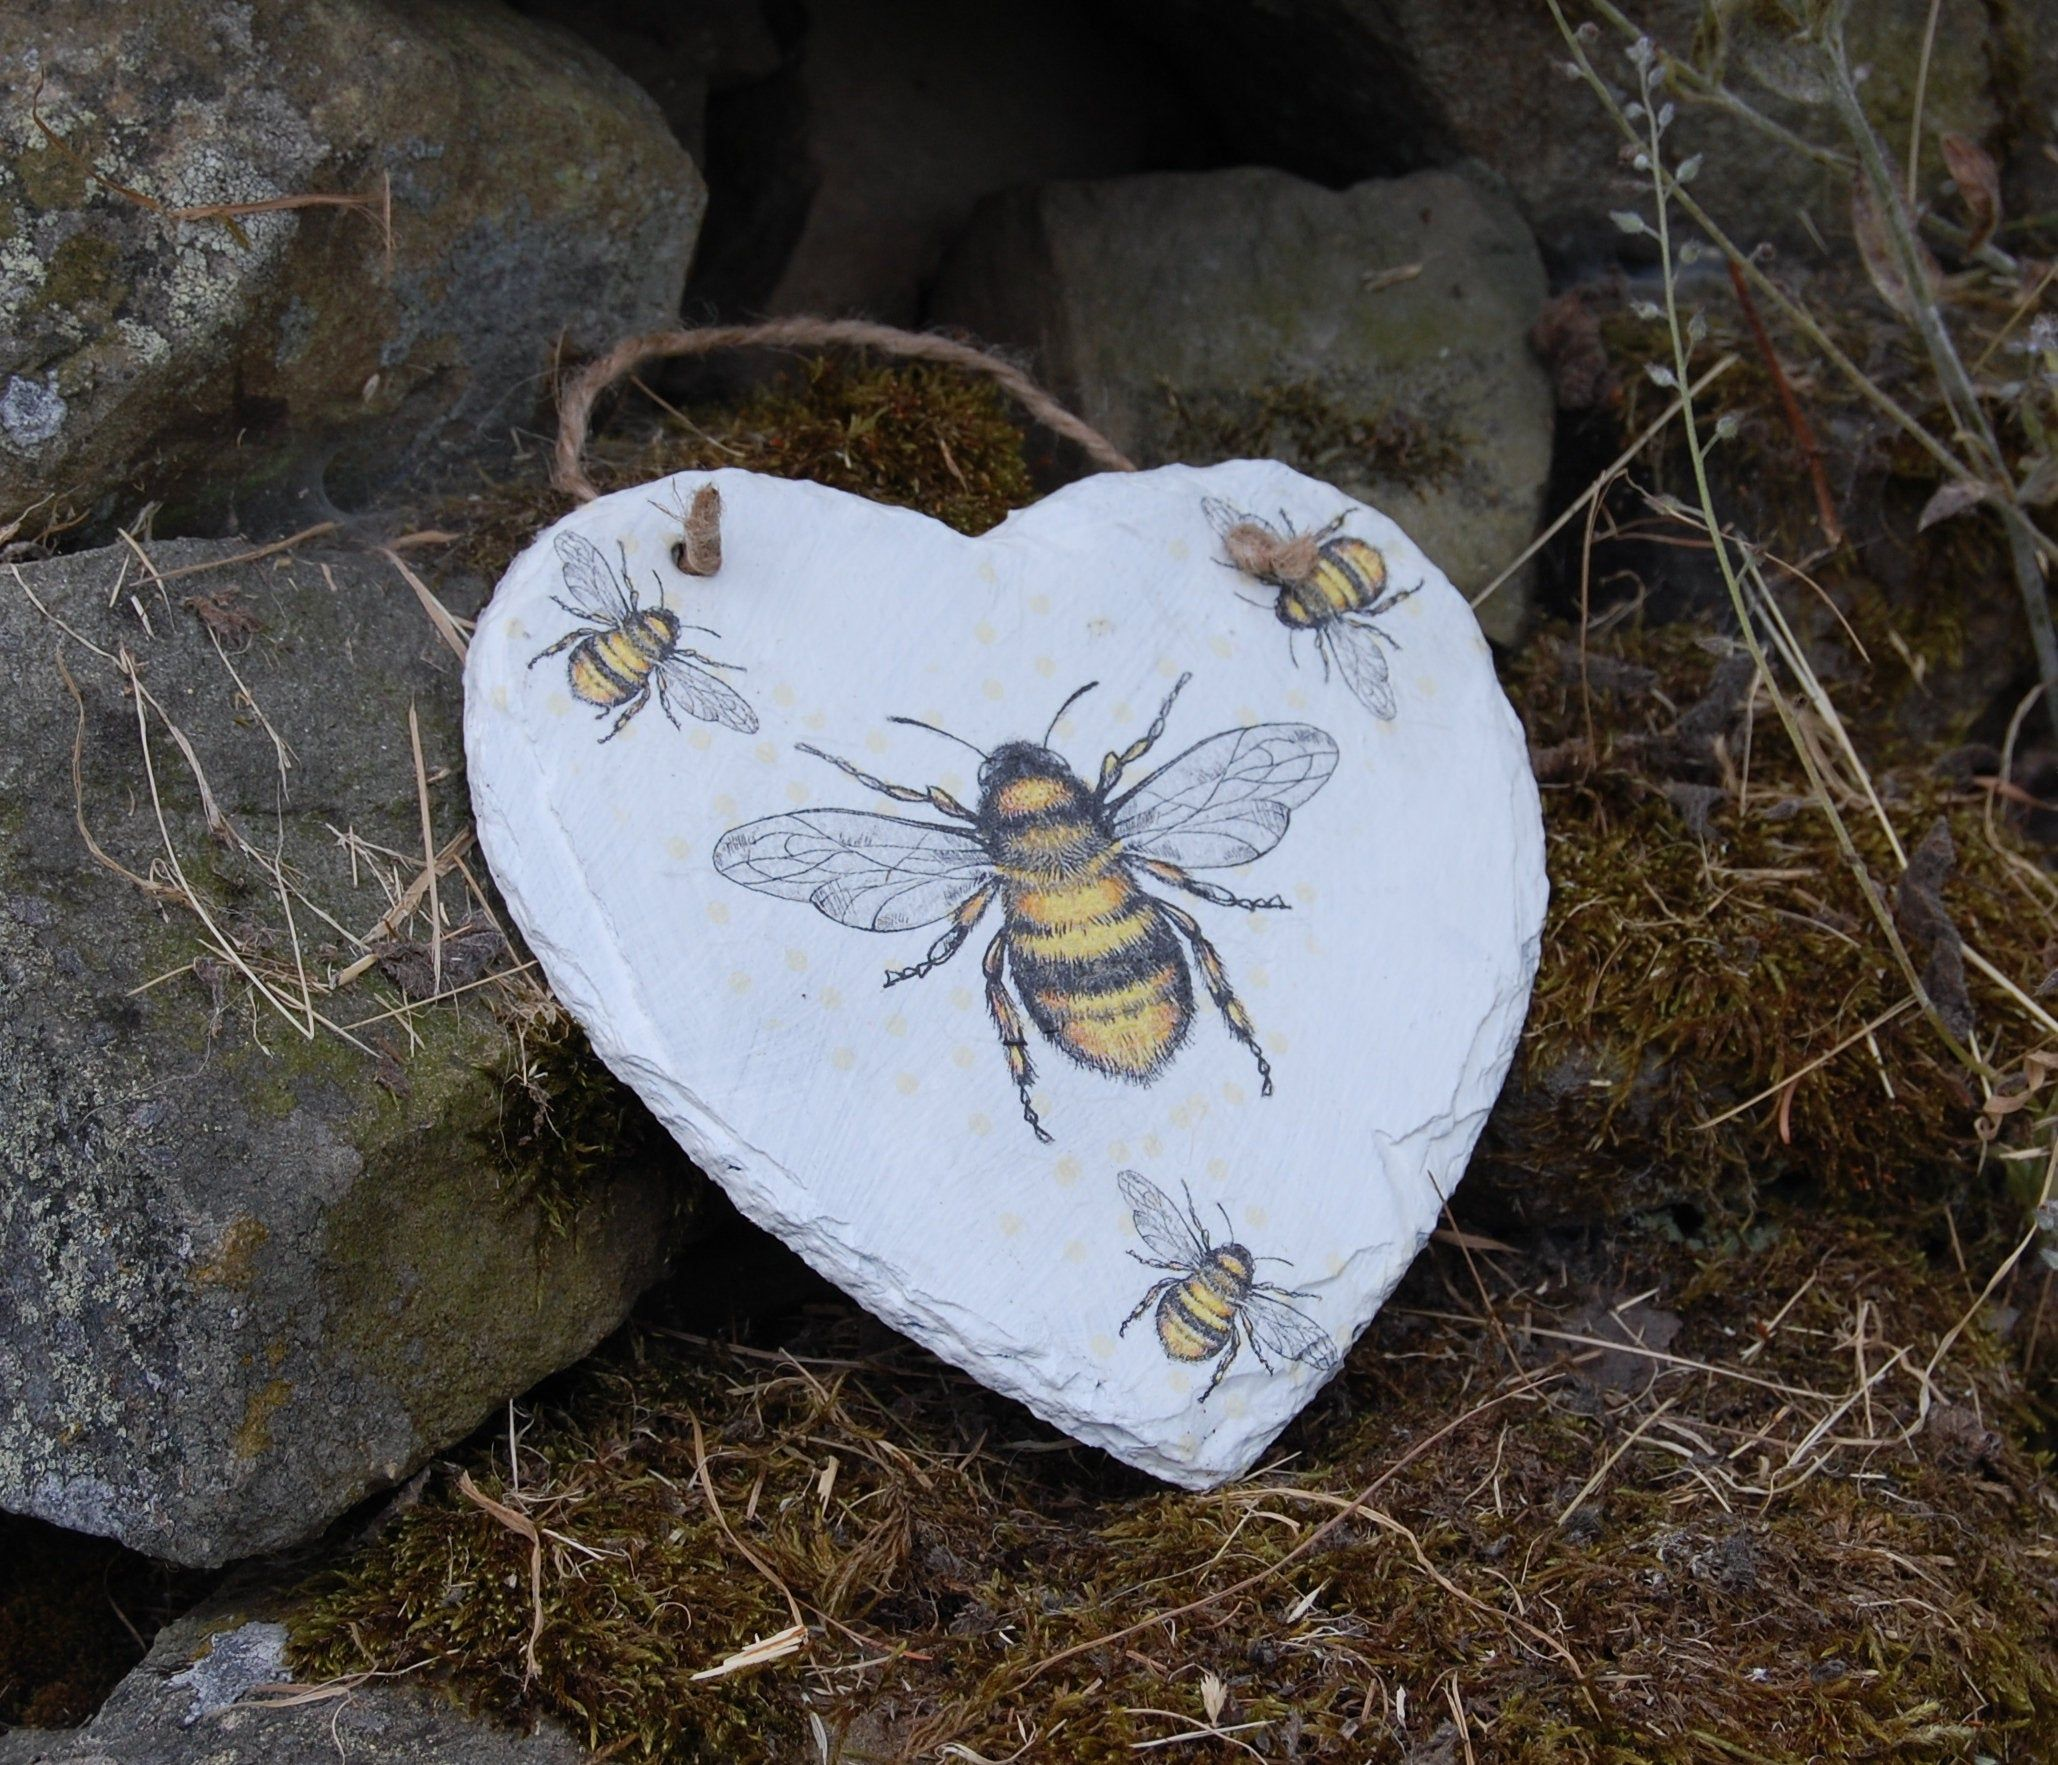 Cute Bumble Bee Modern Garden Sculpture Ornament Outdoor Animal Lovers Gift